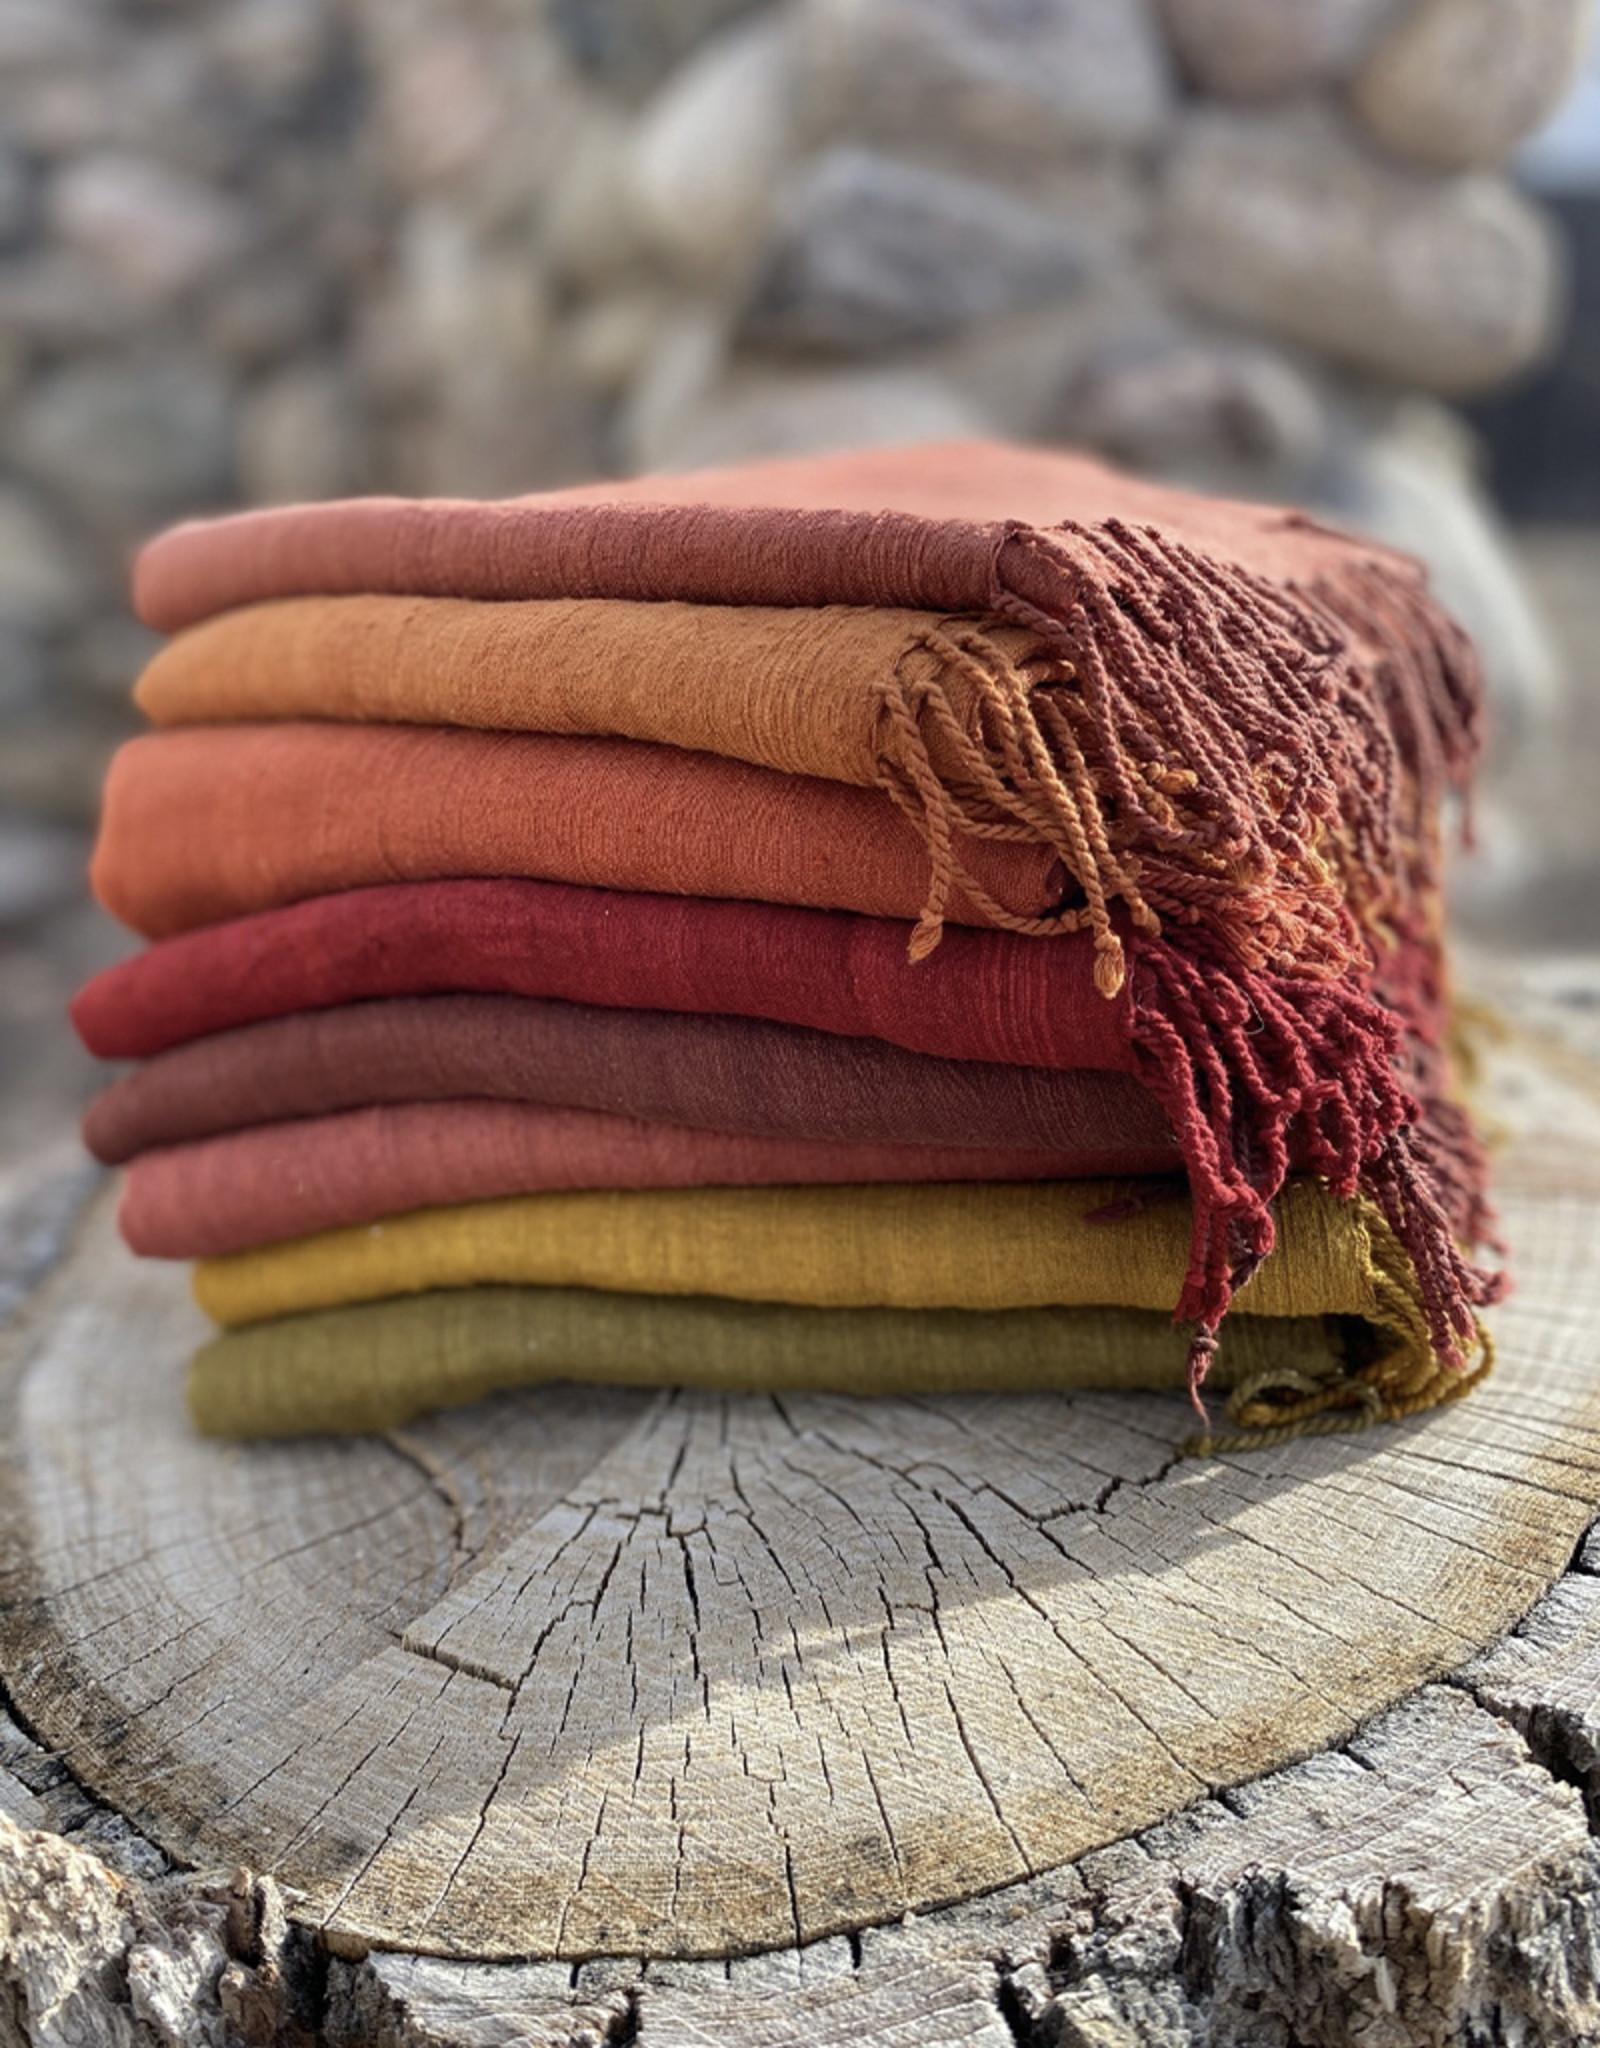 Haridra Handwoven Natural Dye Matka Silk Scarf Chili